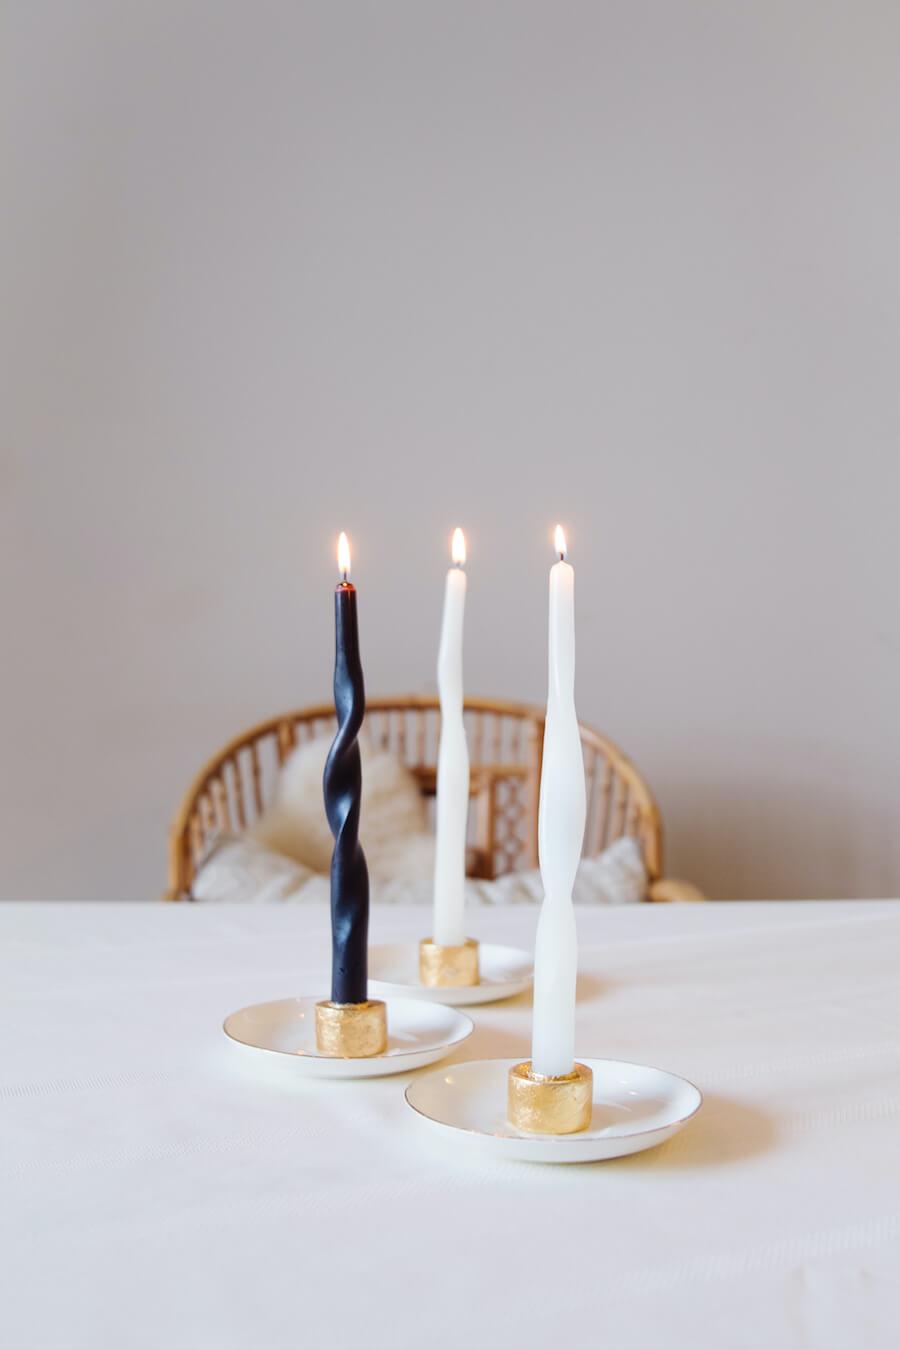 TikTok Twisted Spiral Candles